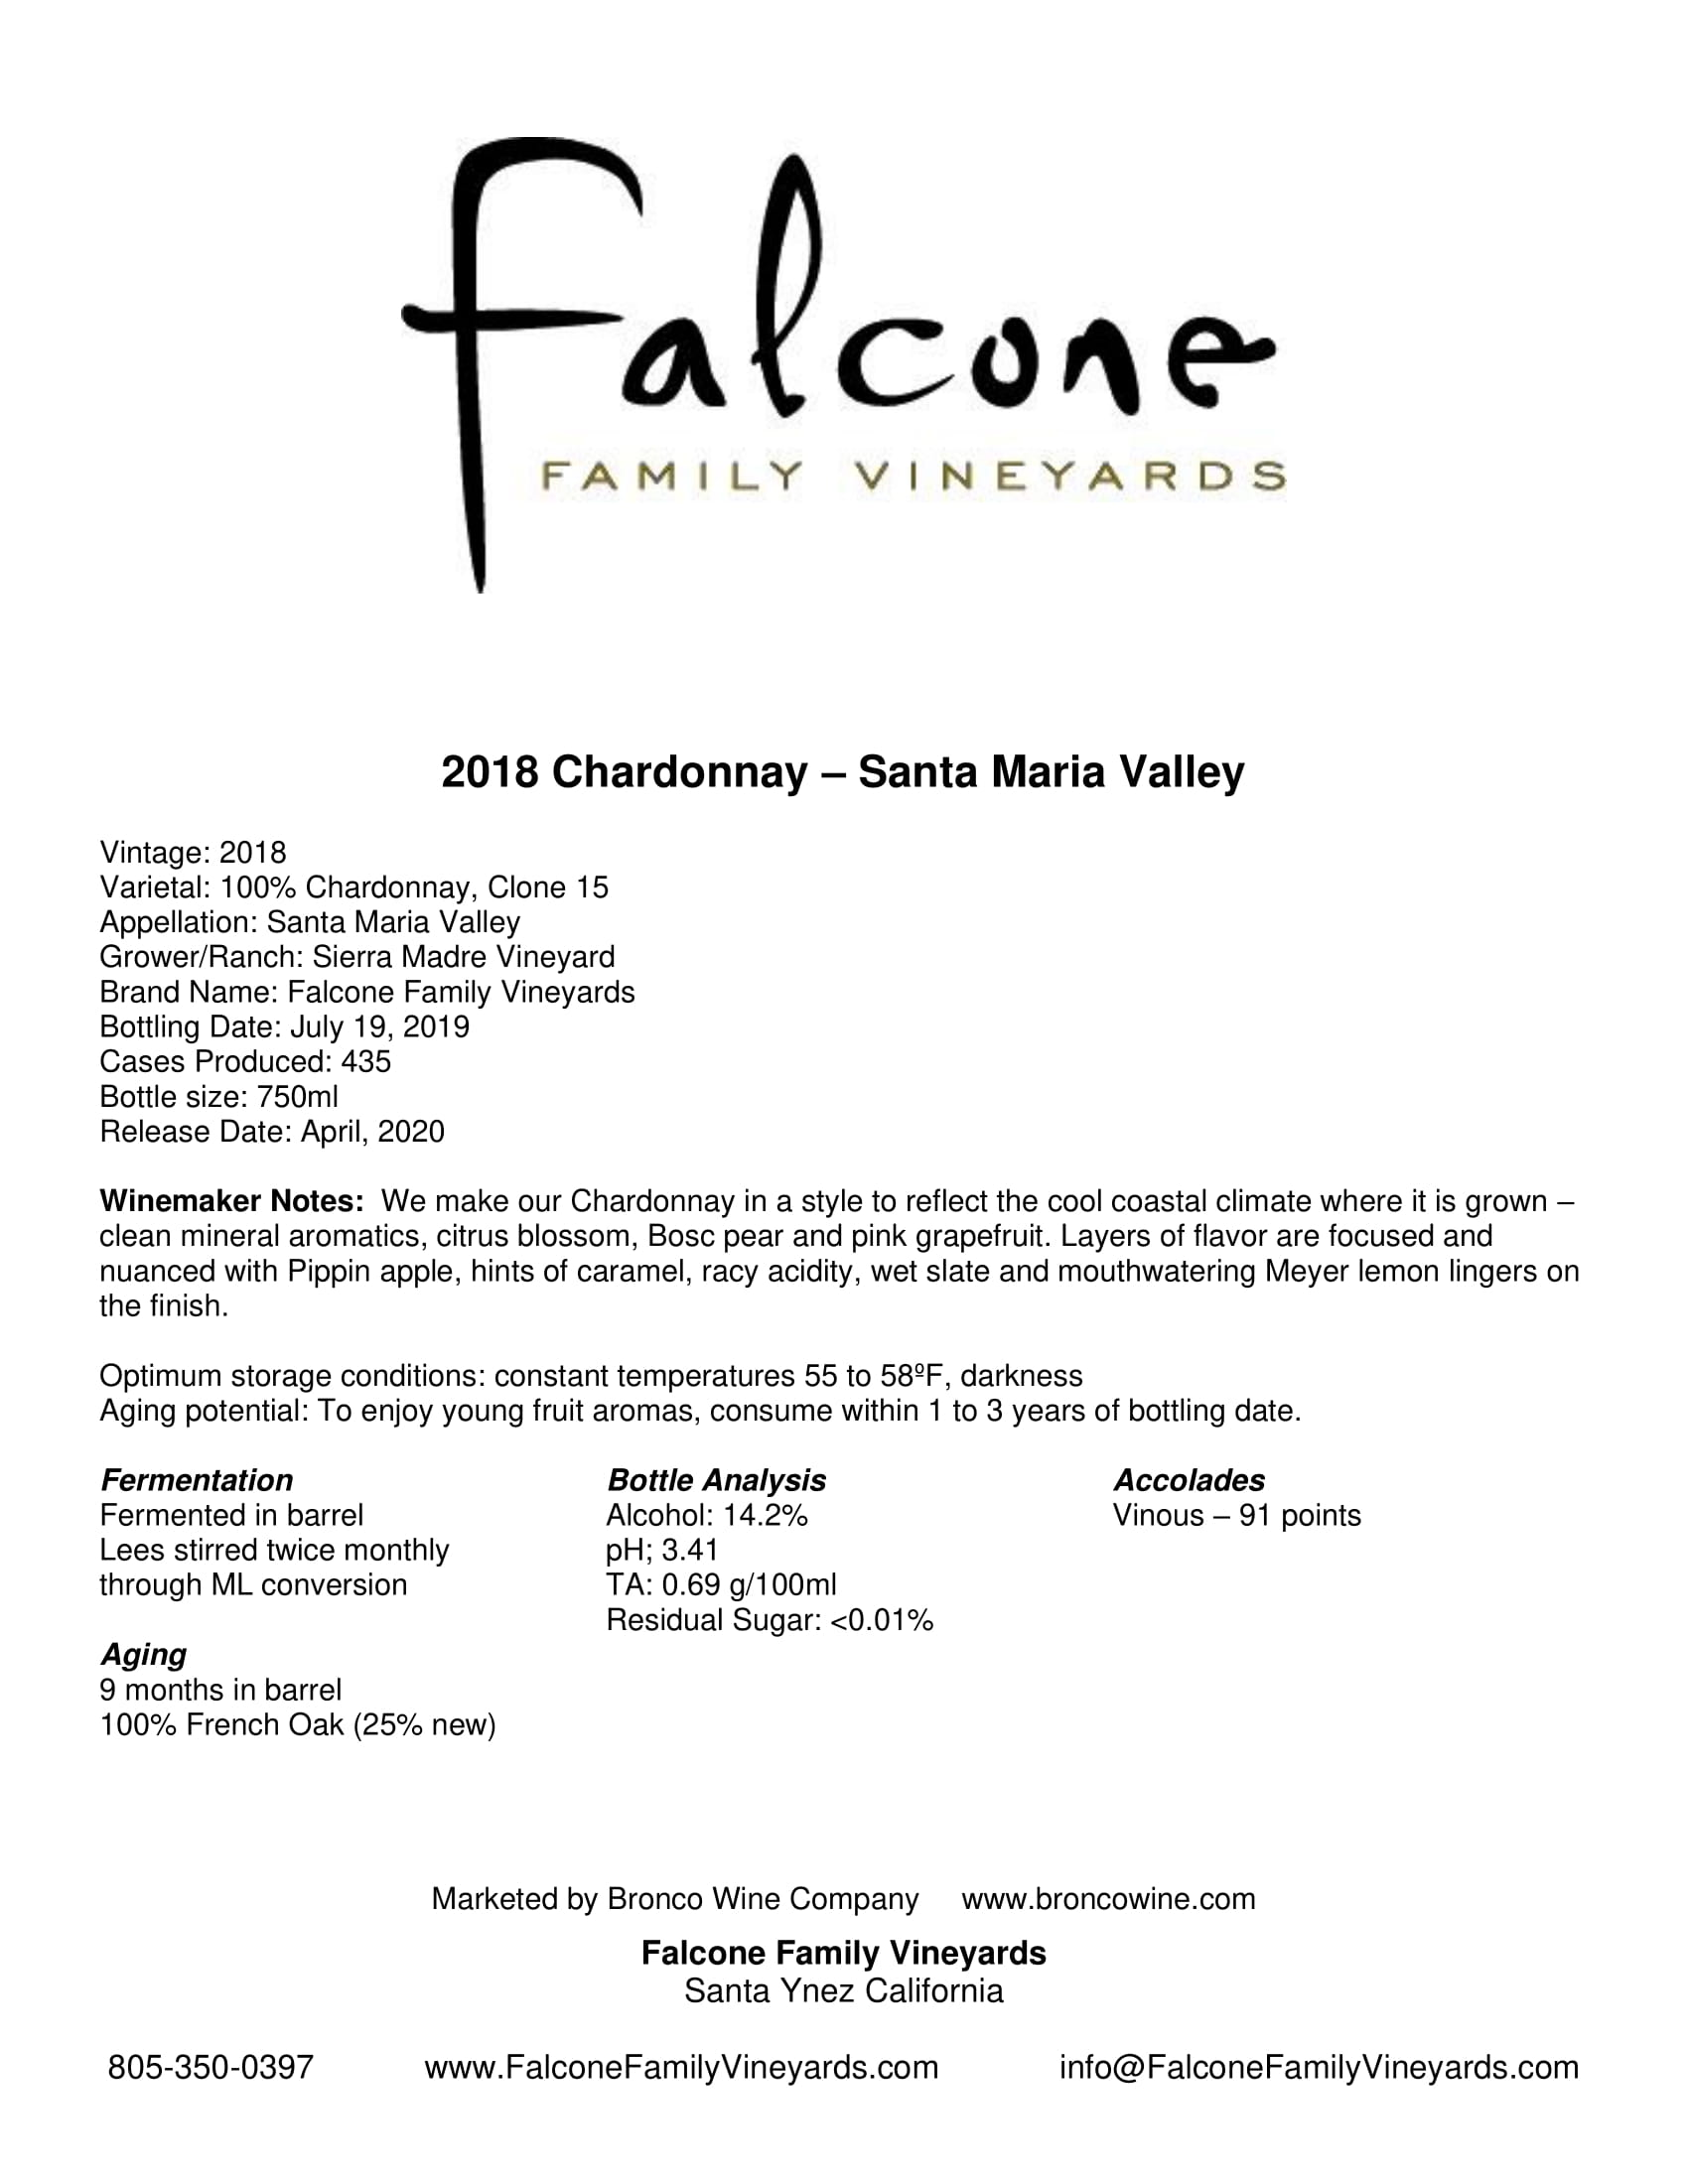 Falcone Family Vineyards Chardonnay Tech Sheet